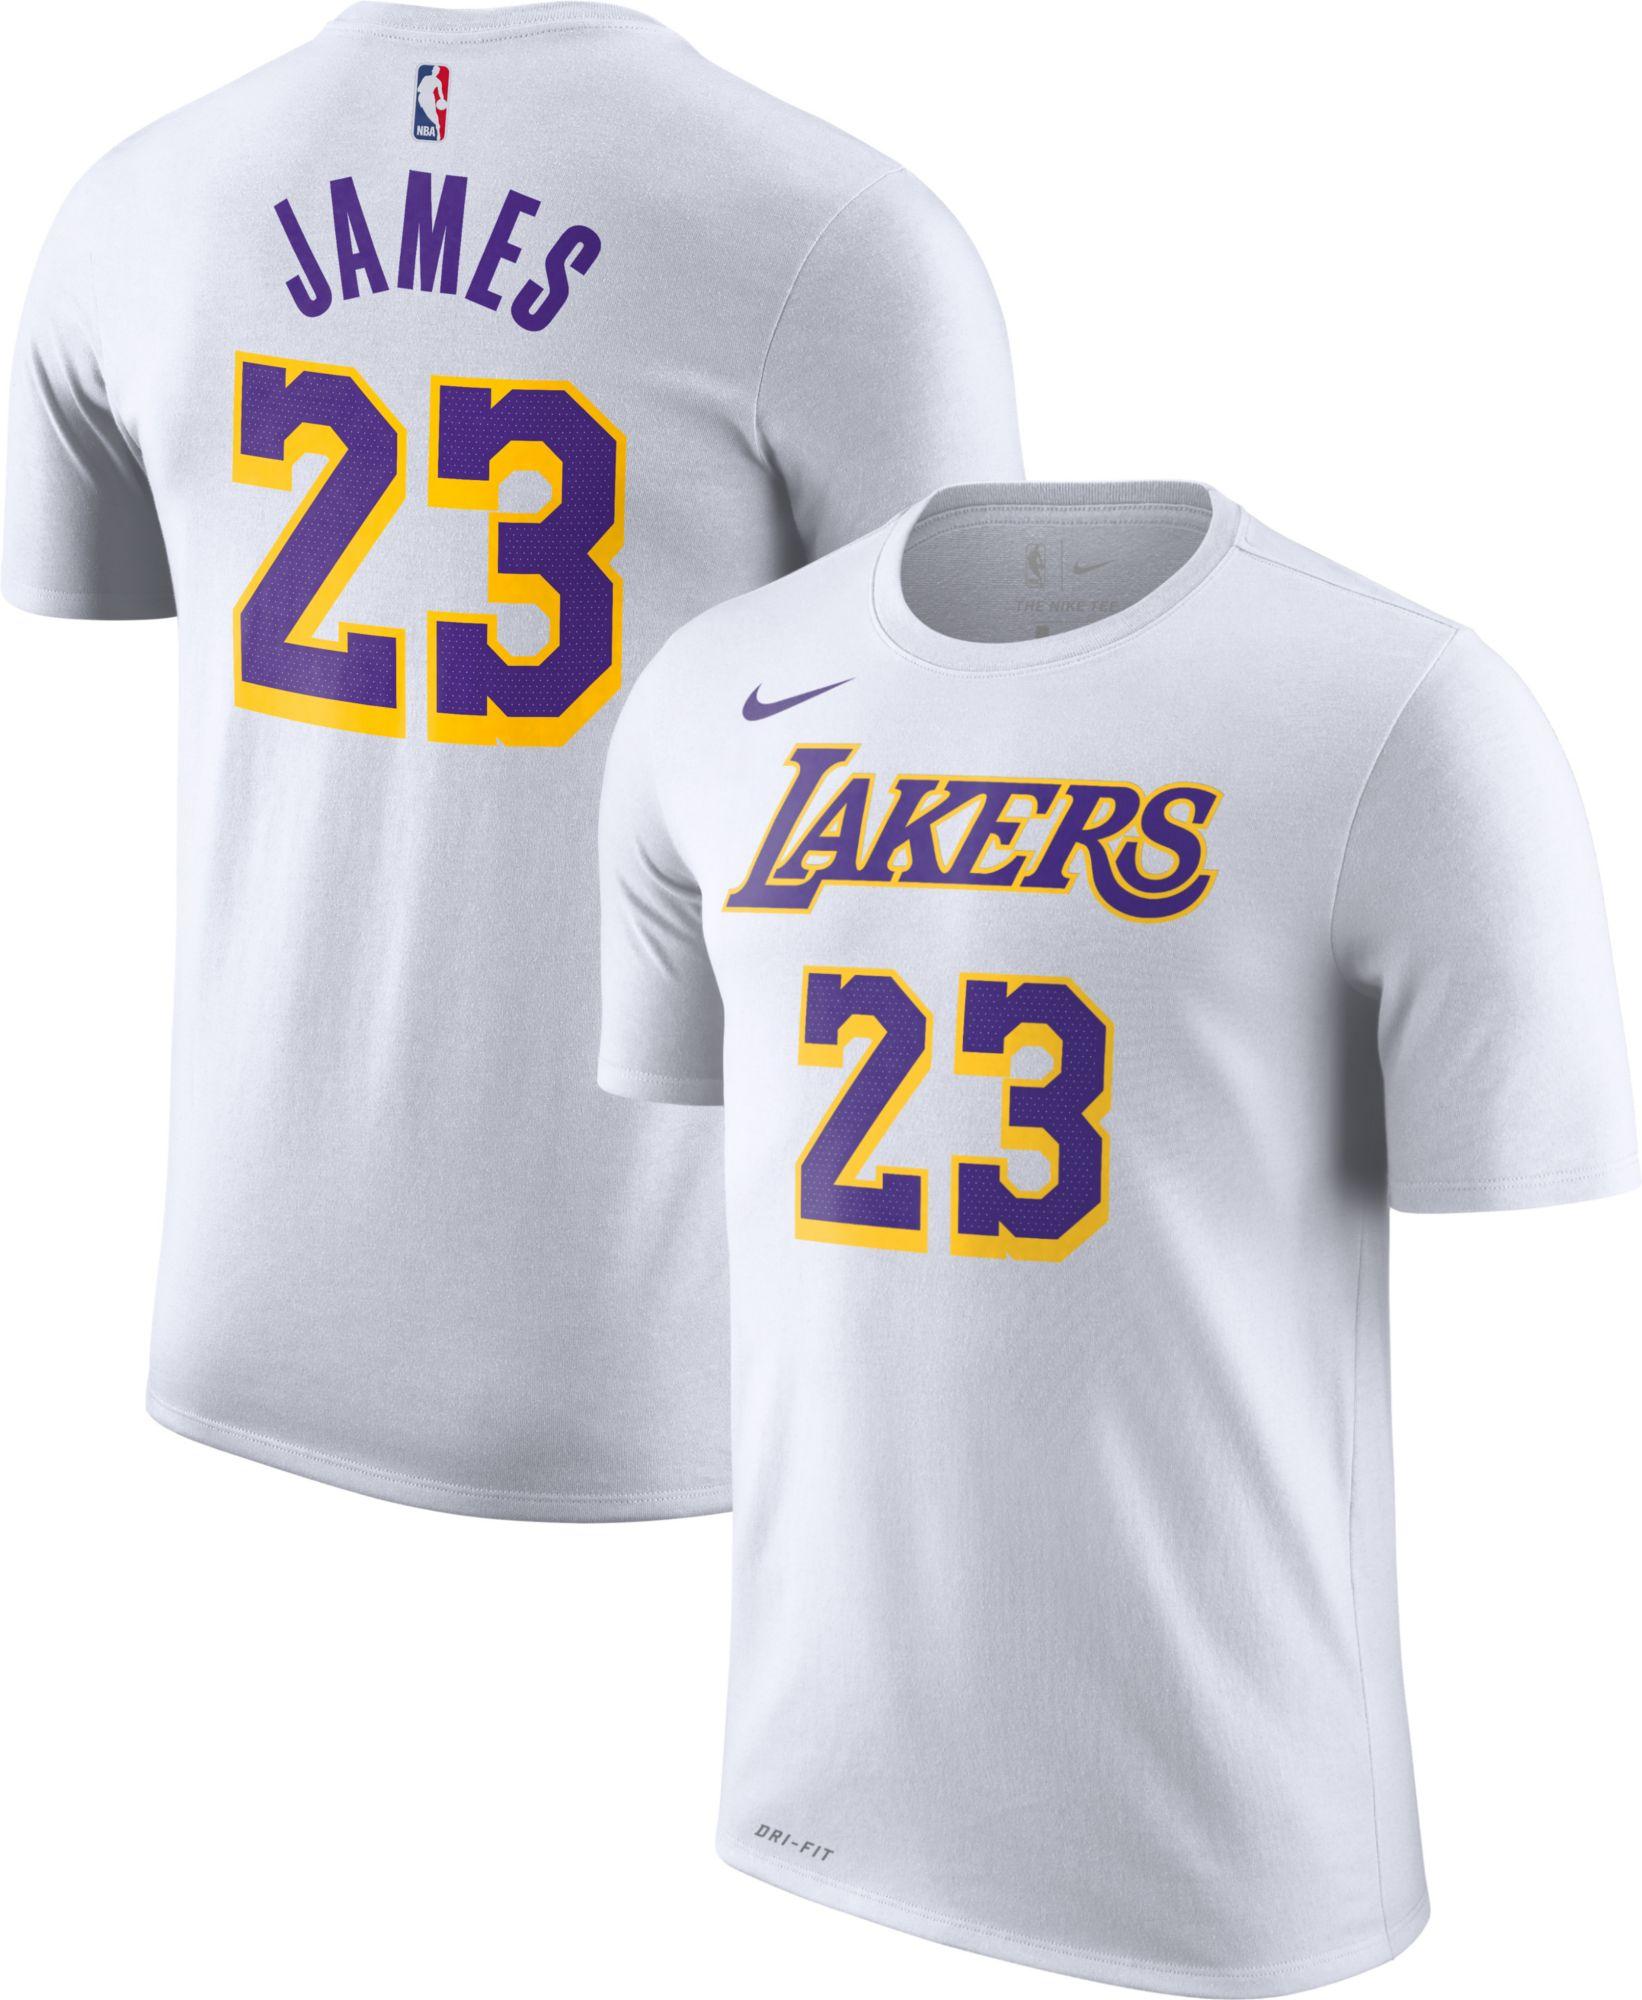 lebron jersey shirt